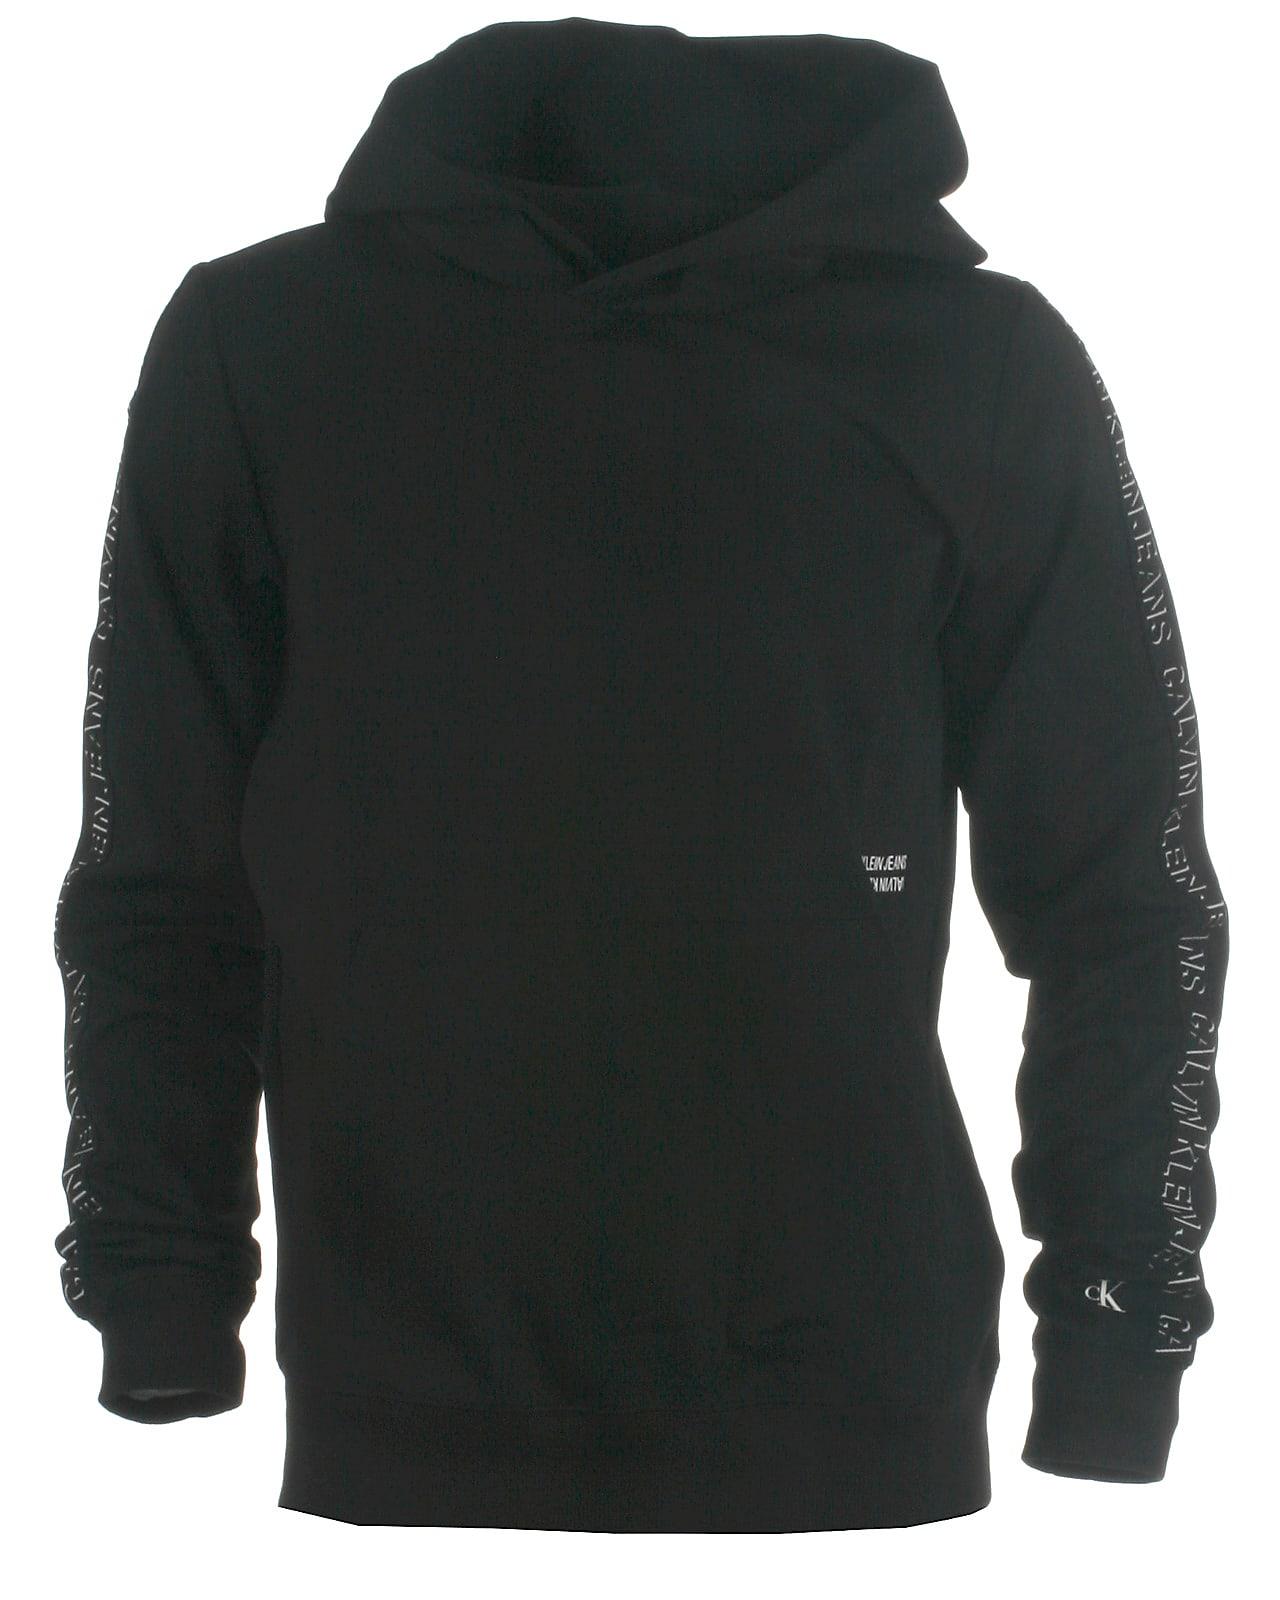 Image of Calvin Klein hood sweat, Shadow, black